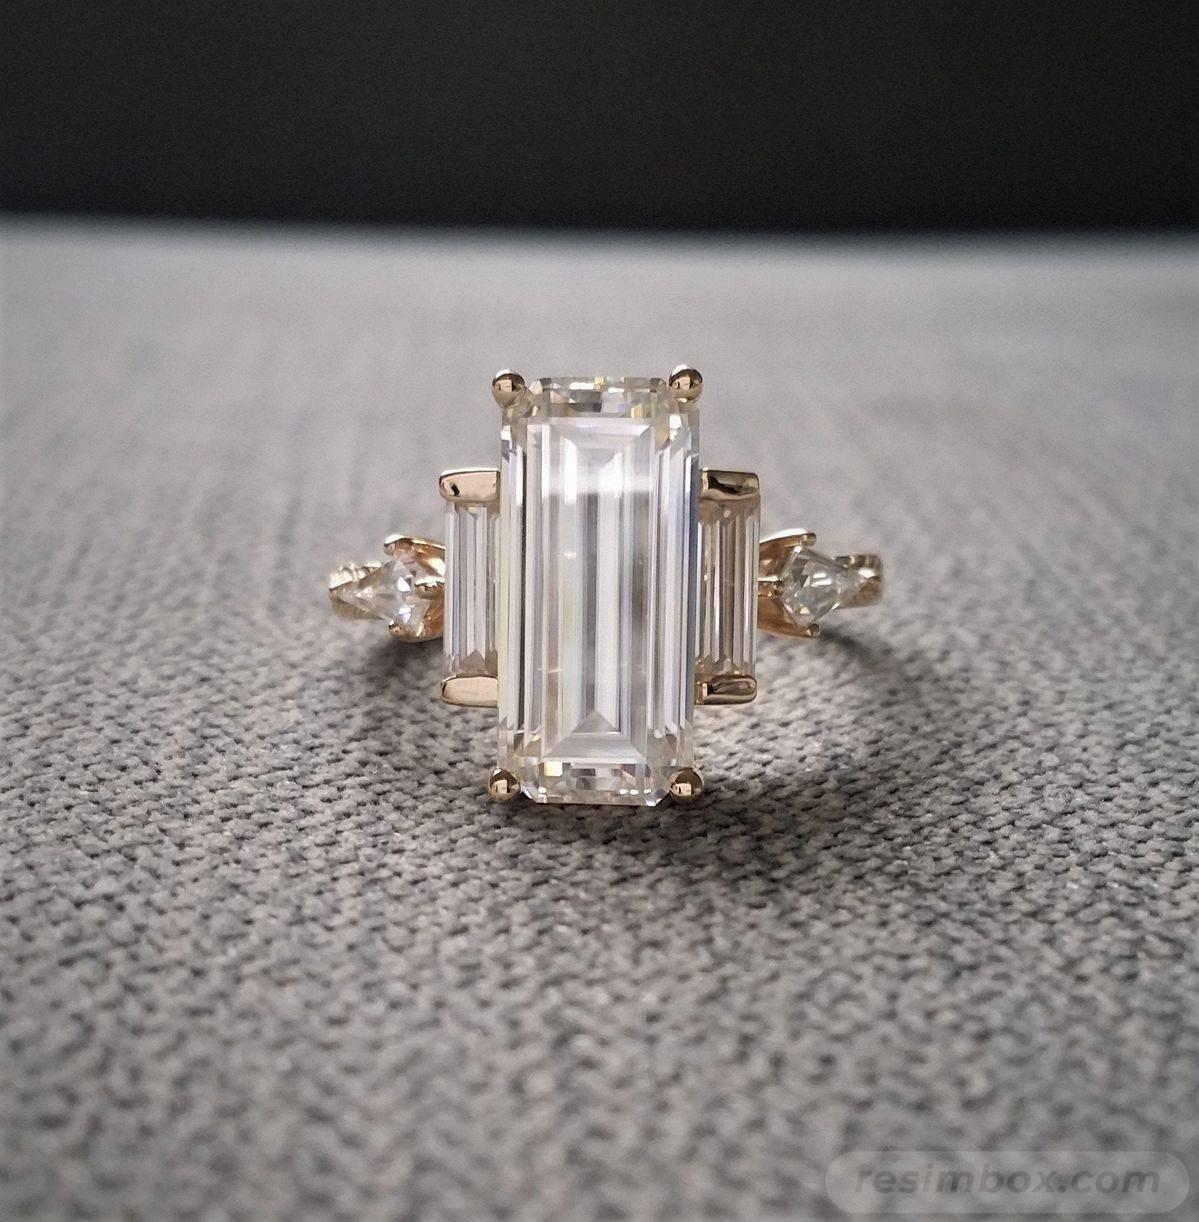 Art deco jewelry-207095282851537706